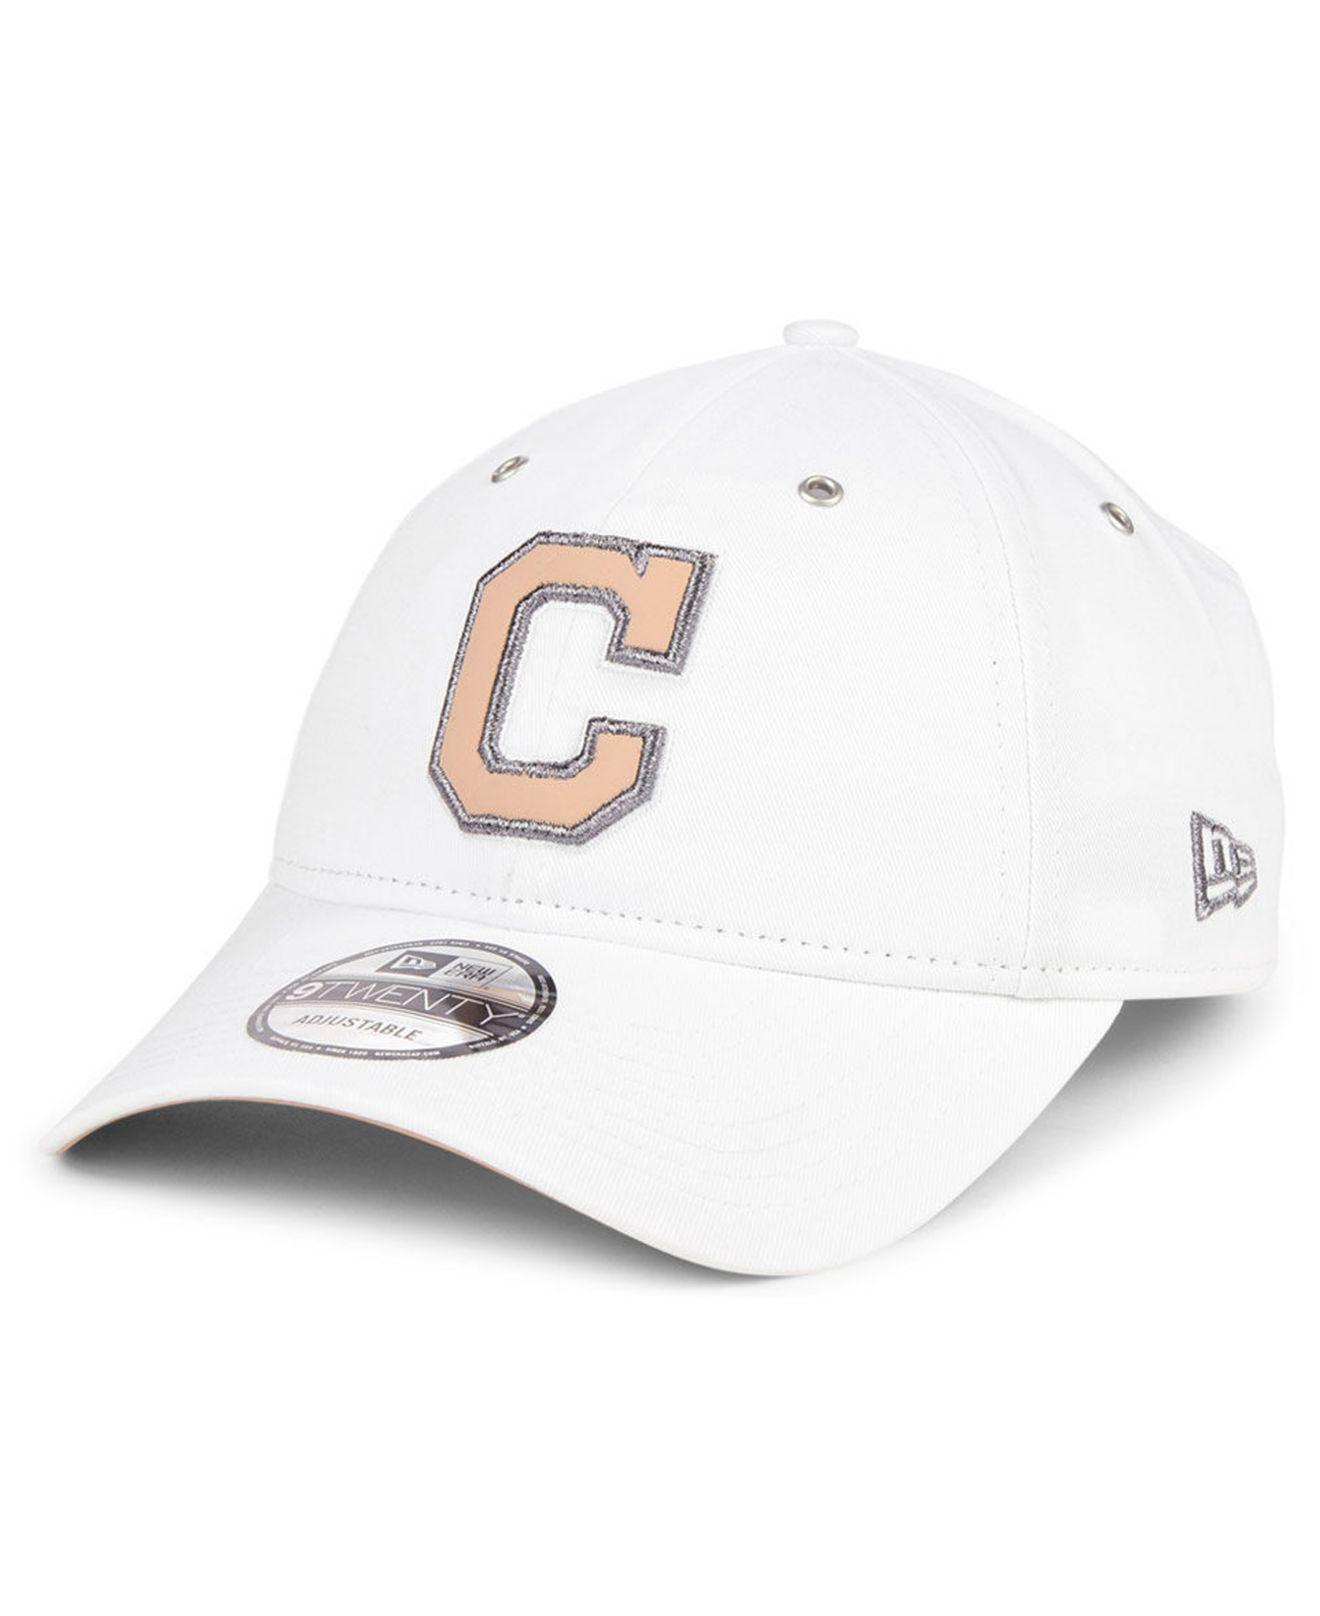 size 40 8d288 61f43 ... new style lyst ktz cleveland indians metallic pastel 9twenty cap in  white 7bc92 3fe13